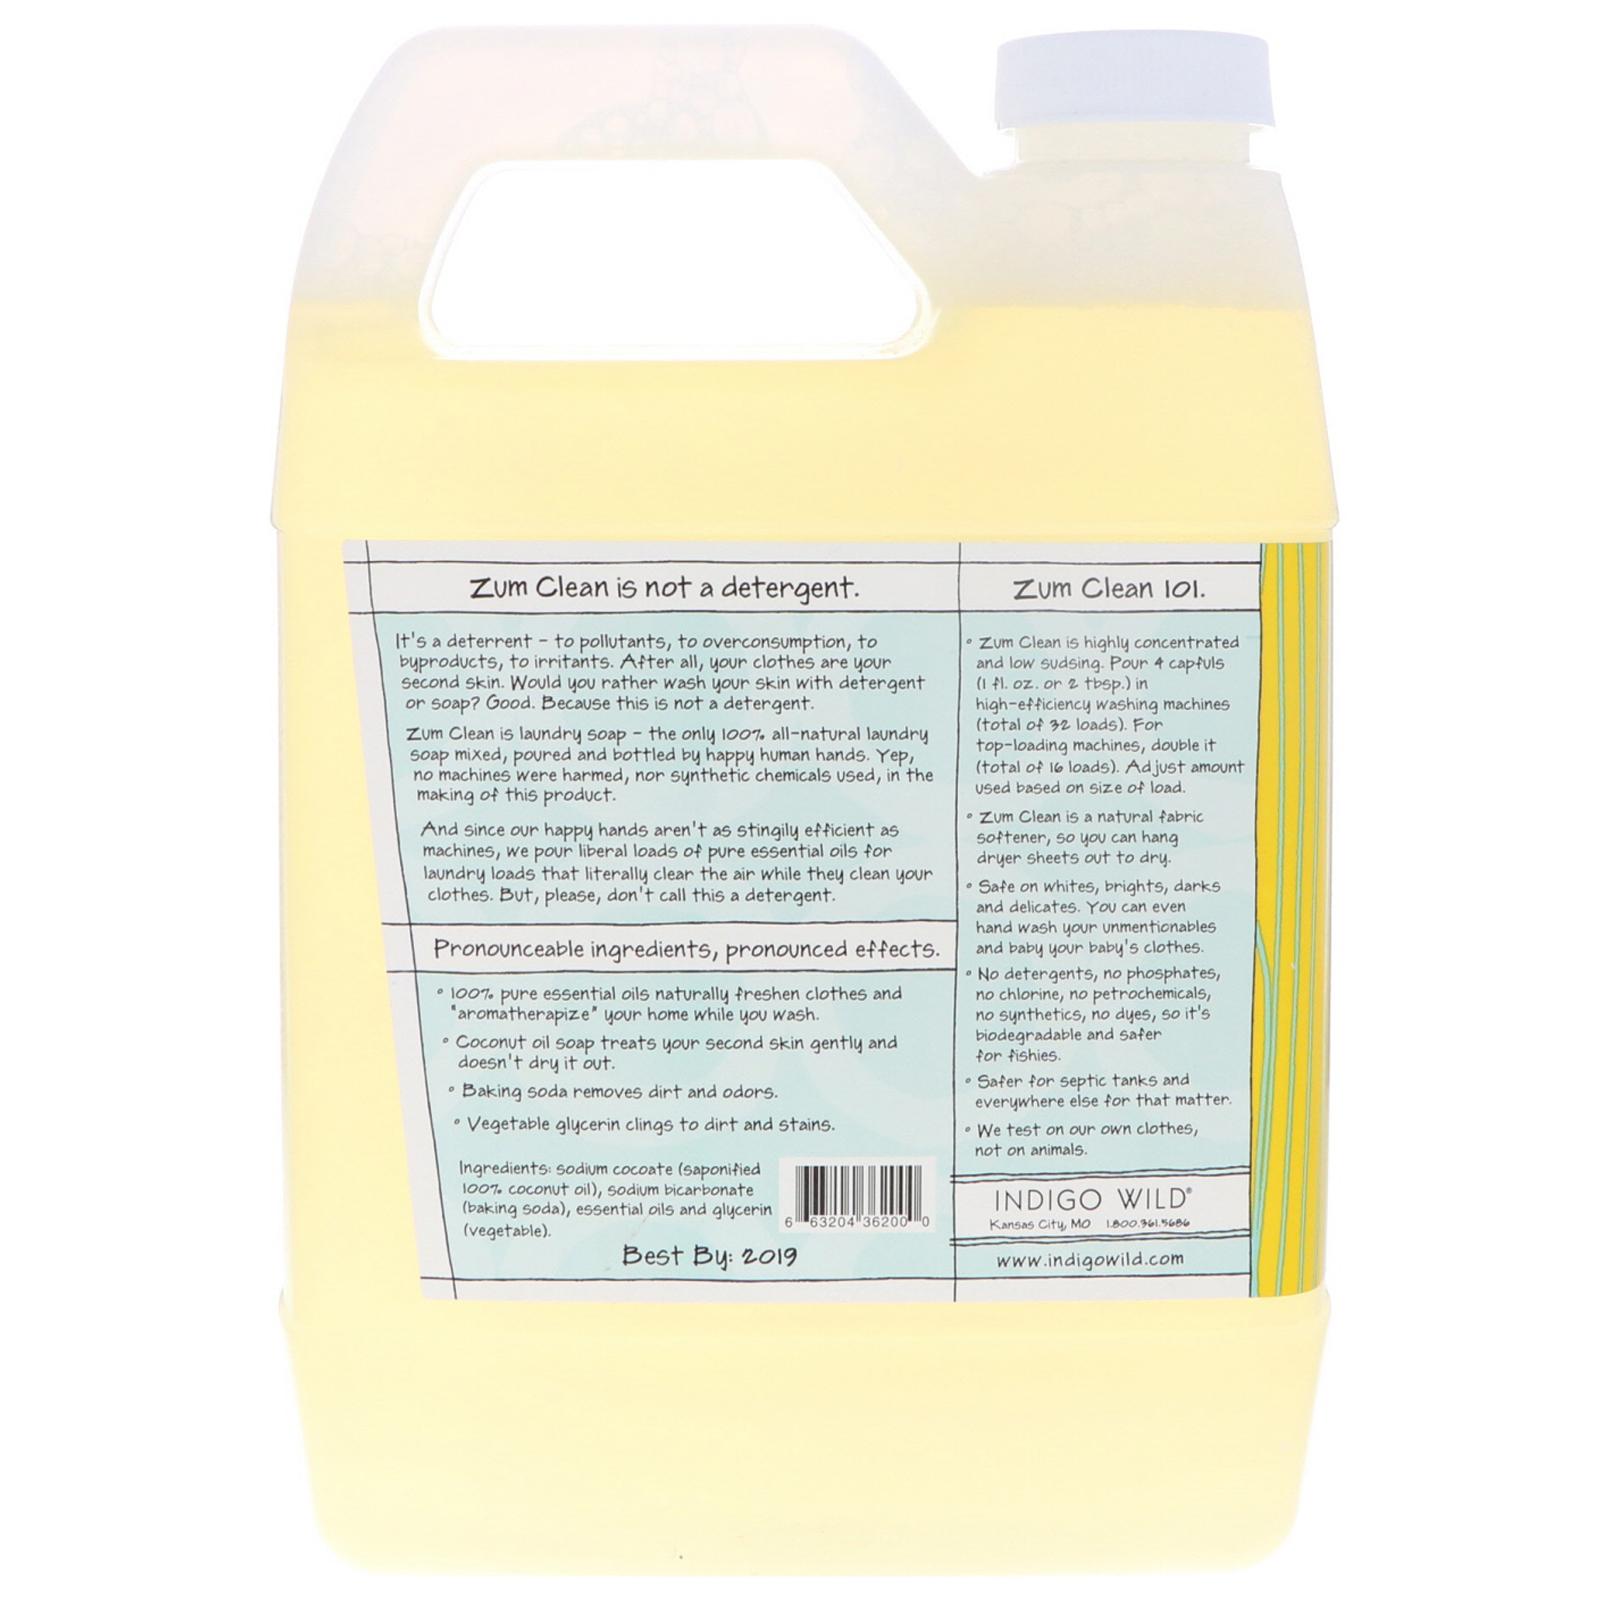 Indigo Wild Zum Clean Aromatherapy Laundry Soap